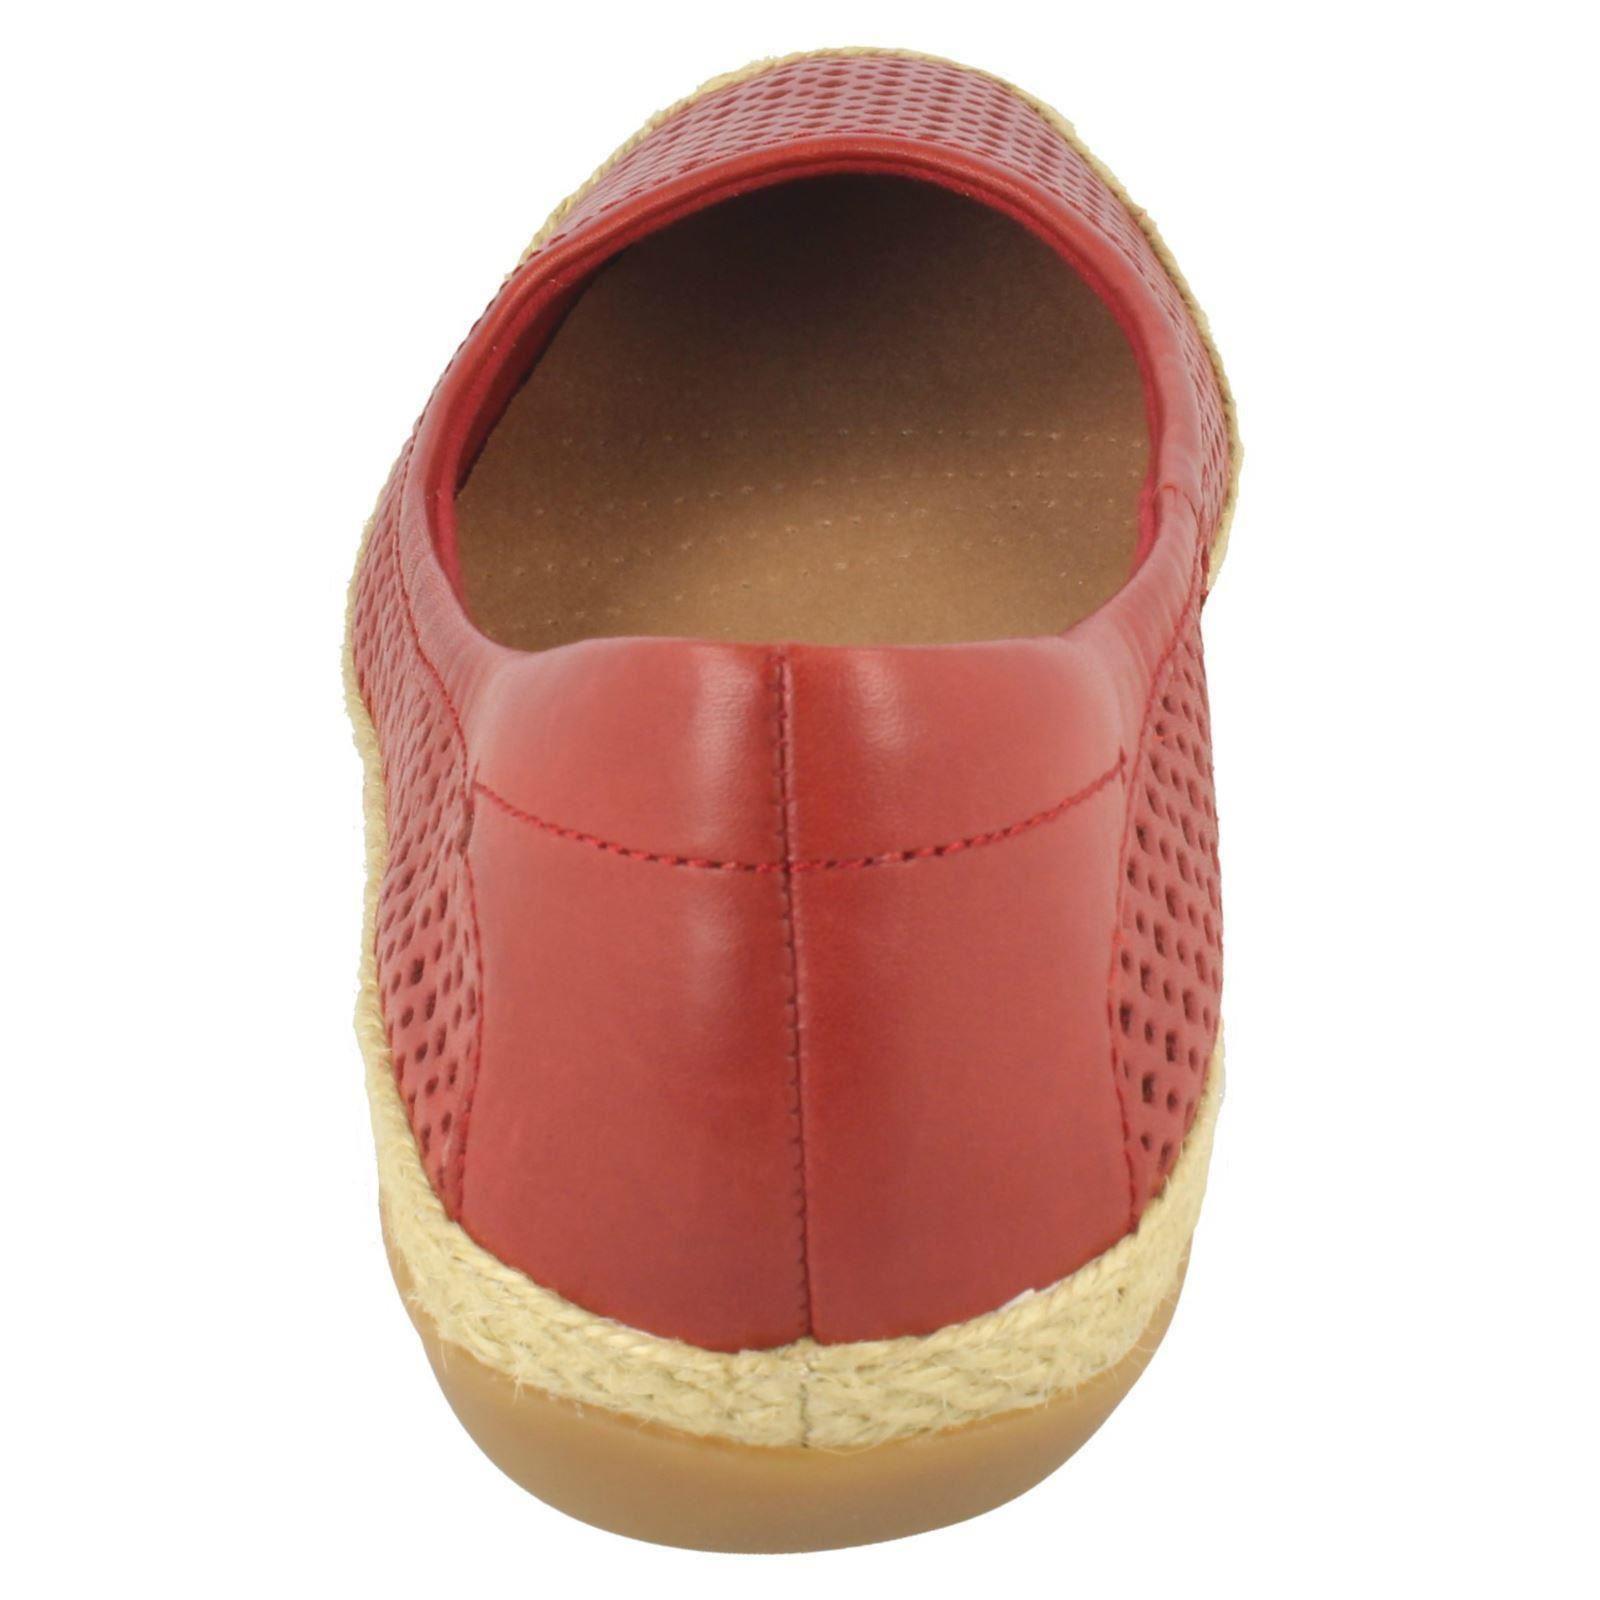 Clarks DANELLY Adira Ladies Summer Ballerina Flat Shoes